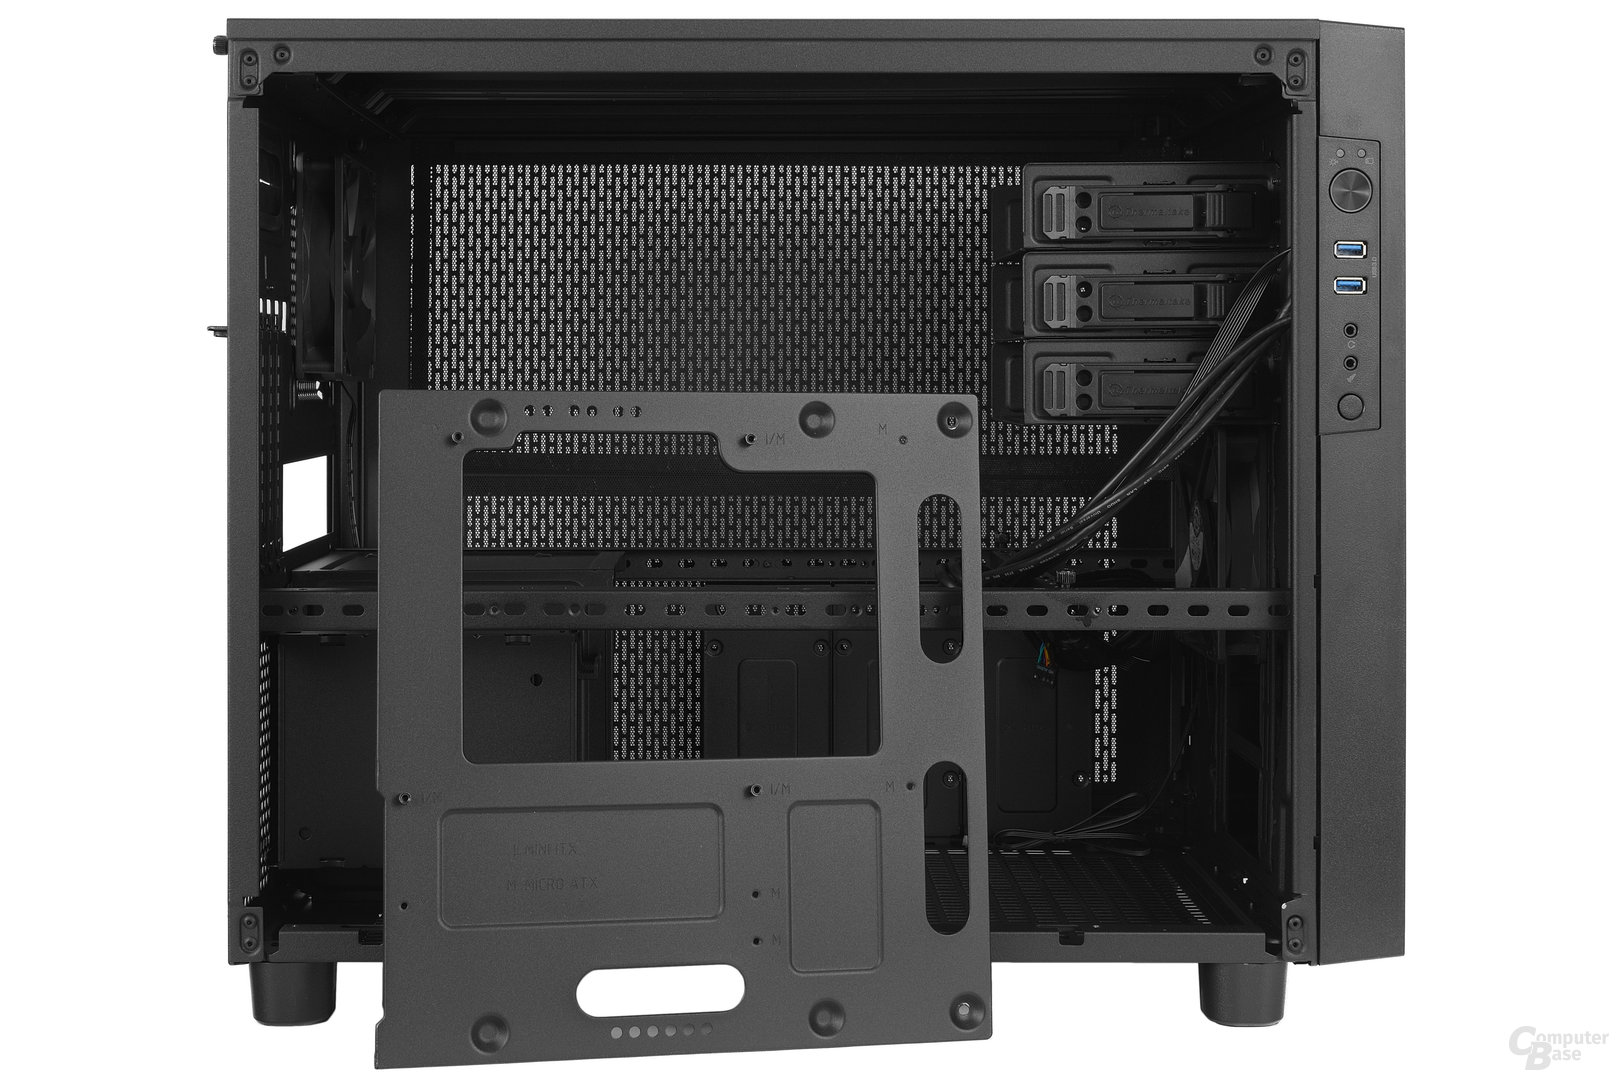 Thermaltake Core X2 – Mainboardtray entfernt